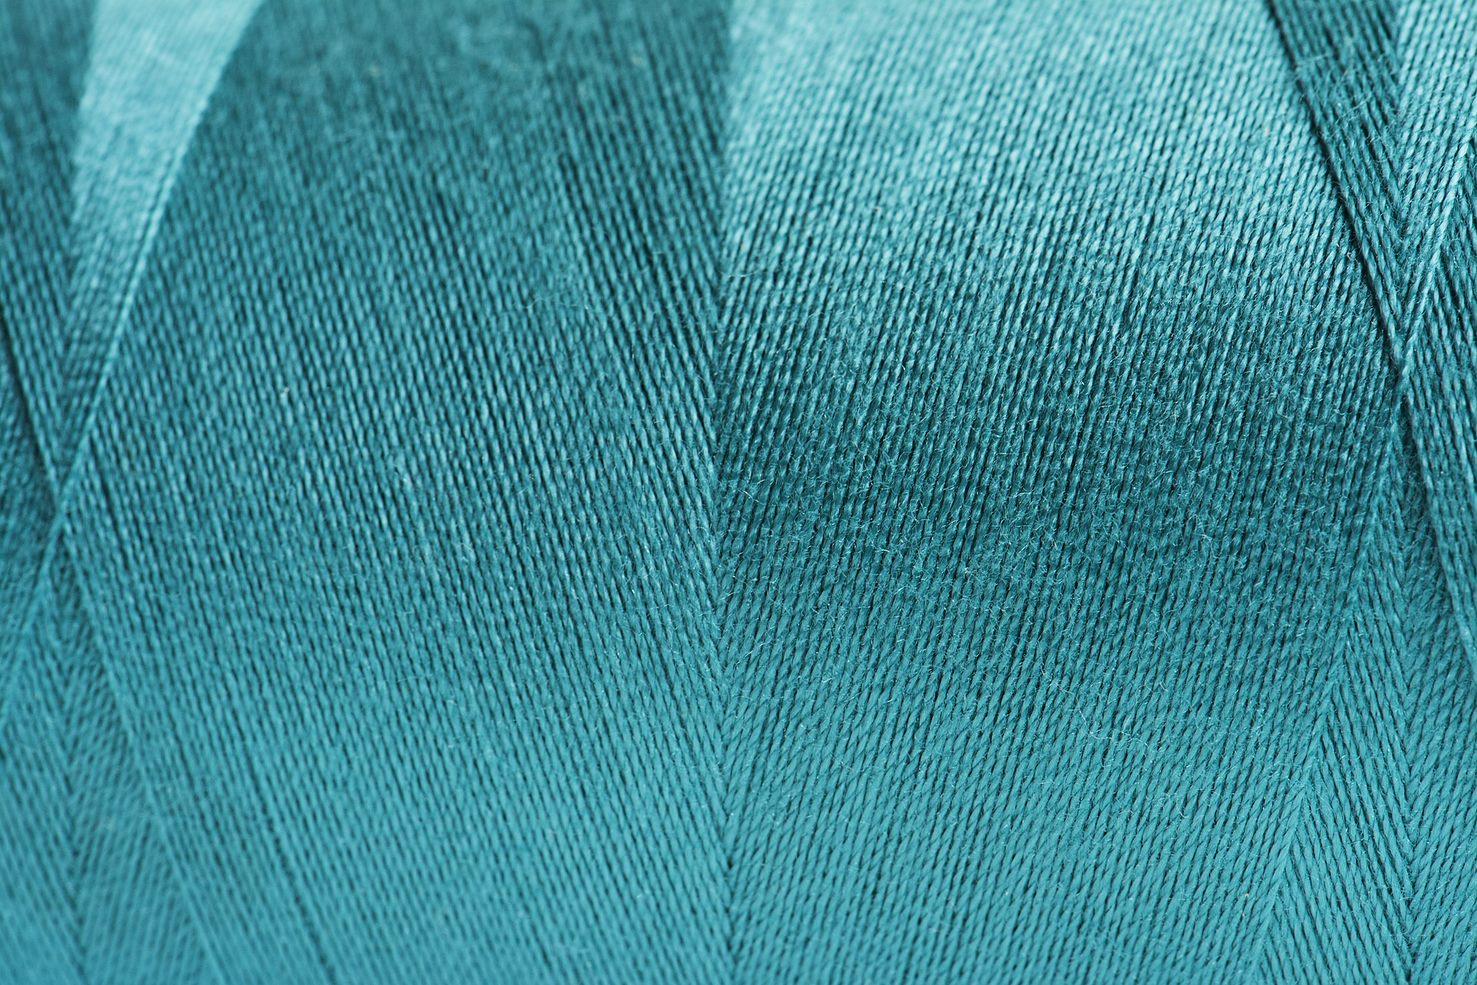 Understanding Fabrics: Fabric Construction